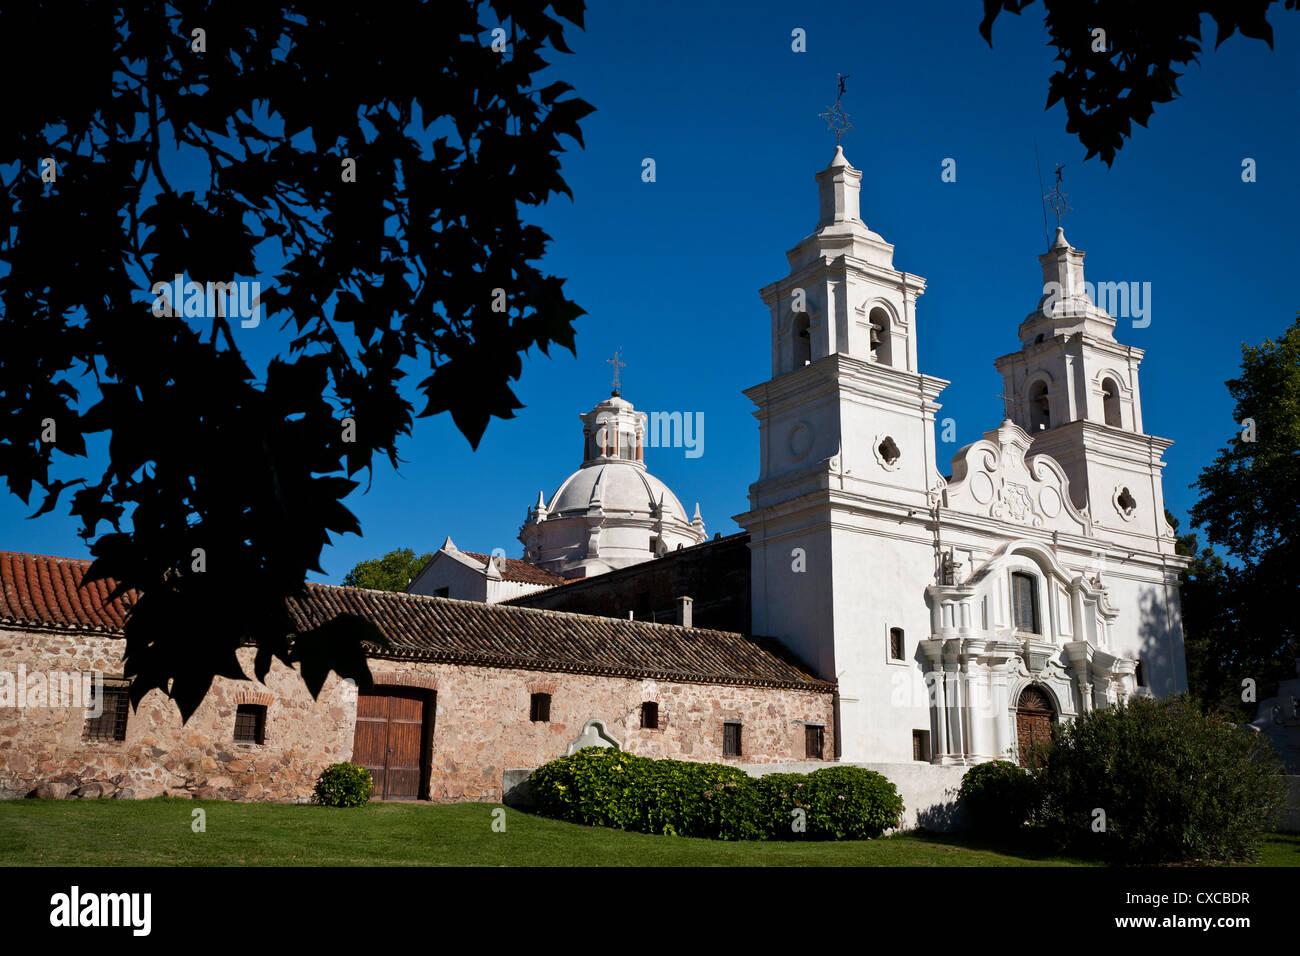 Santa Catalina Jesuit estancia, Cordoba Province, Argentina. - Stock Image